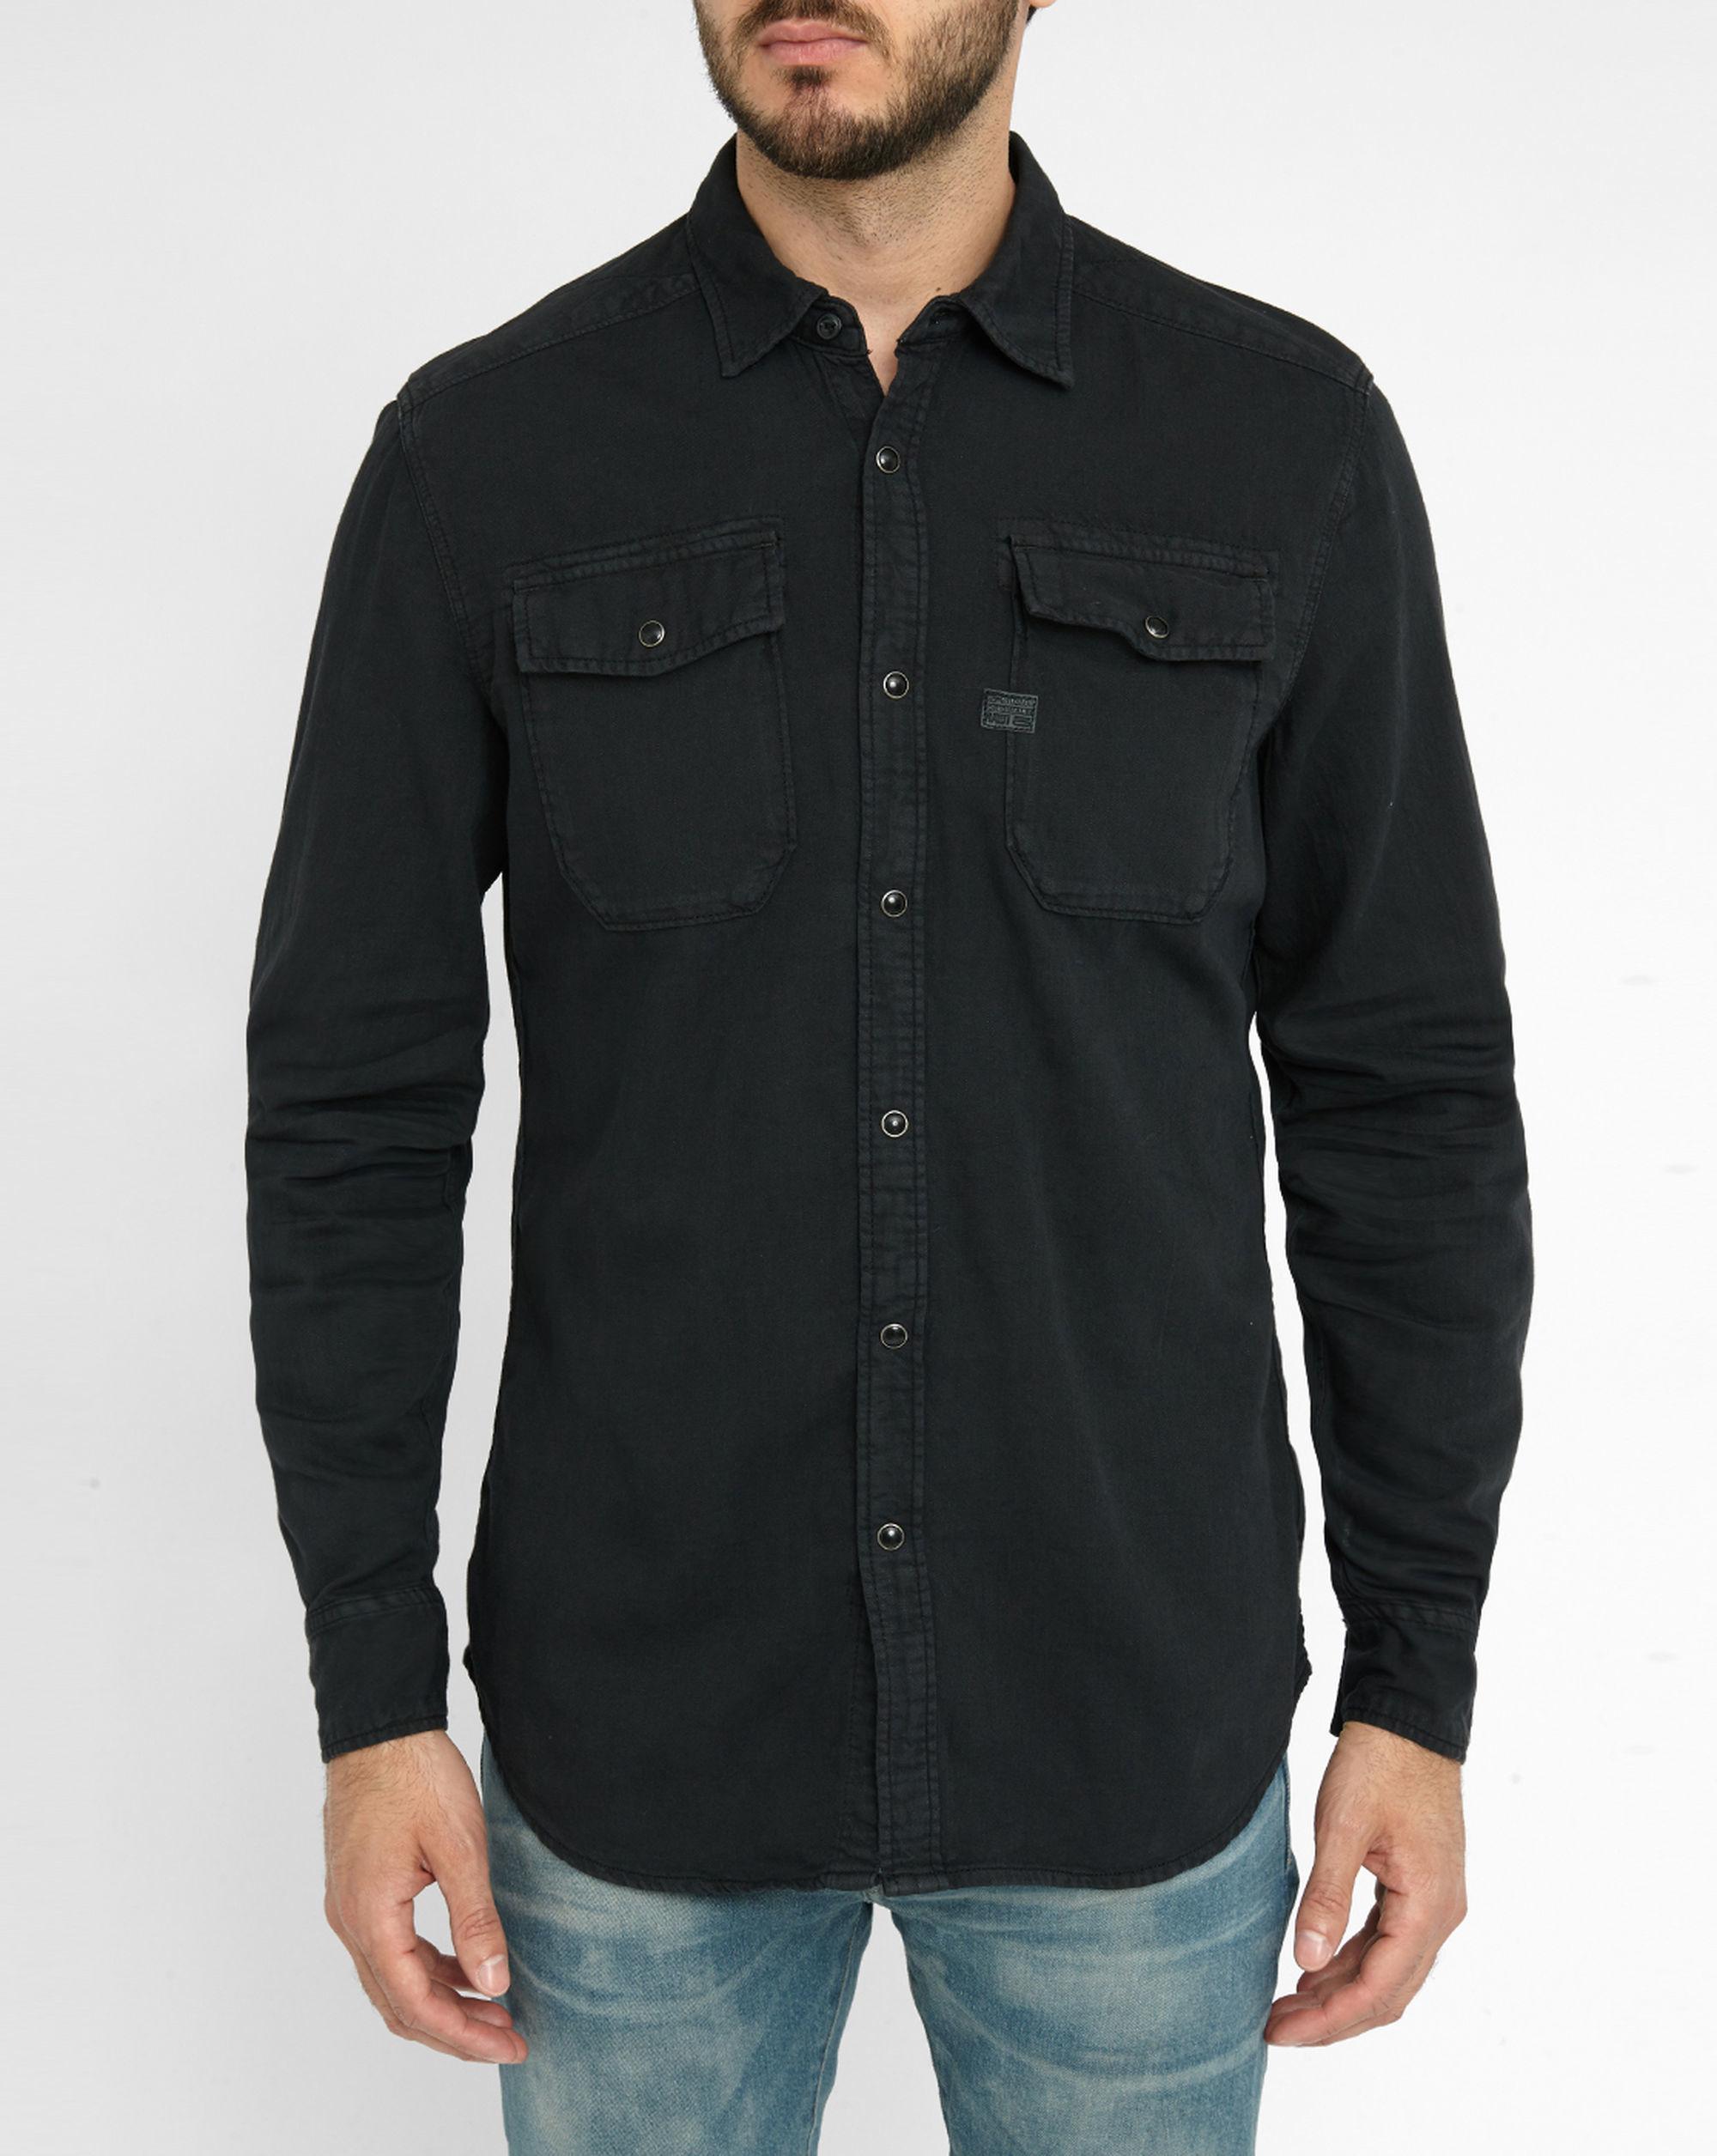 G star raw black denim shirt with press stud patch pockets for Dress shirt studs uk